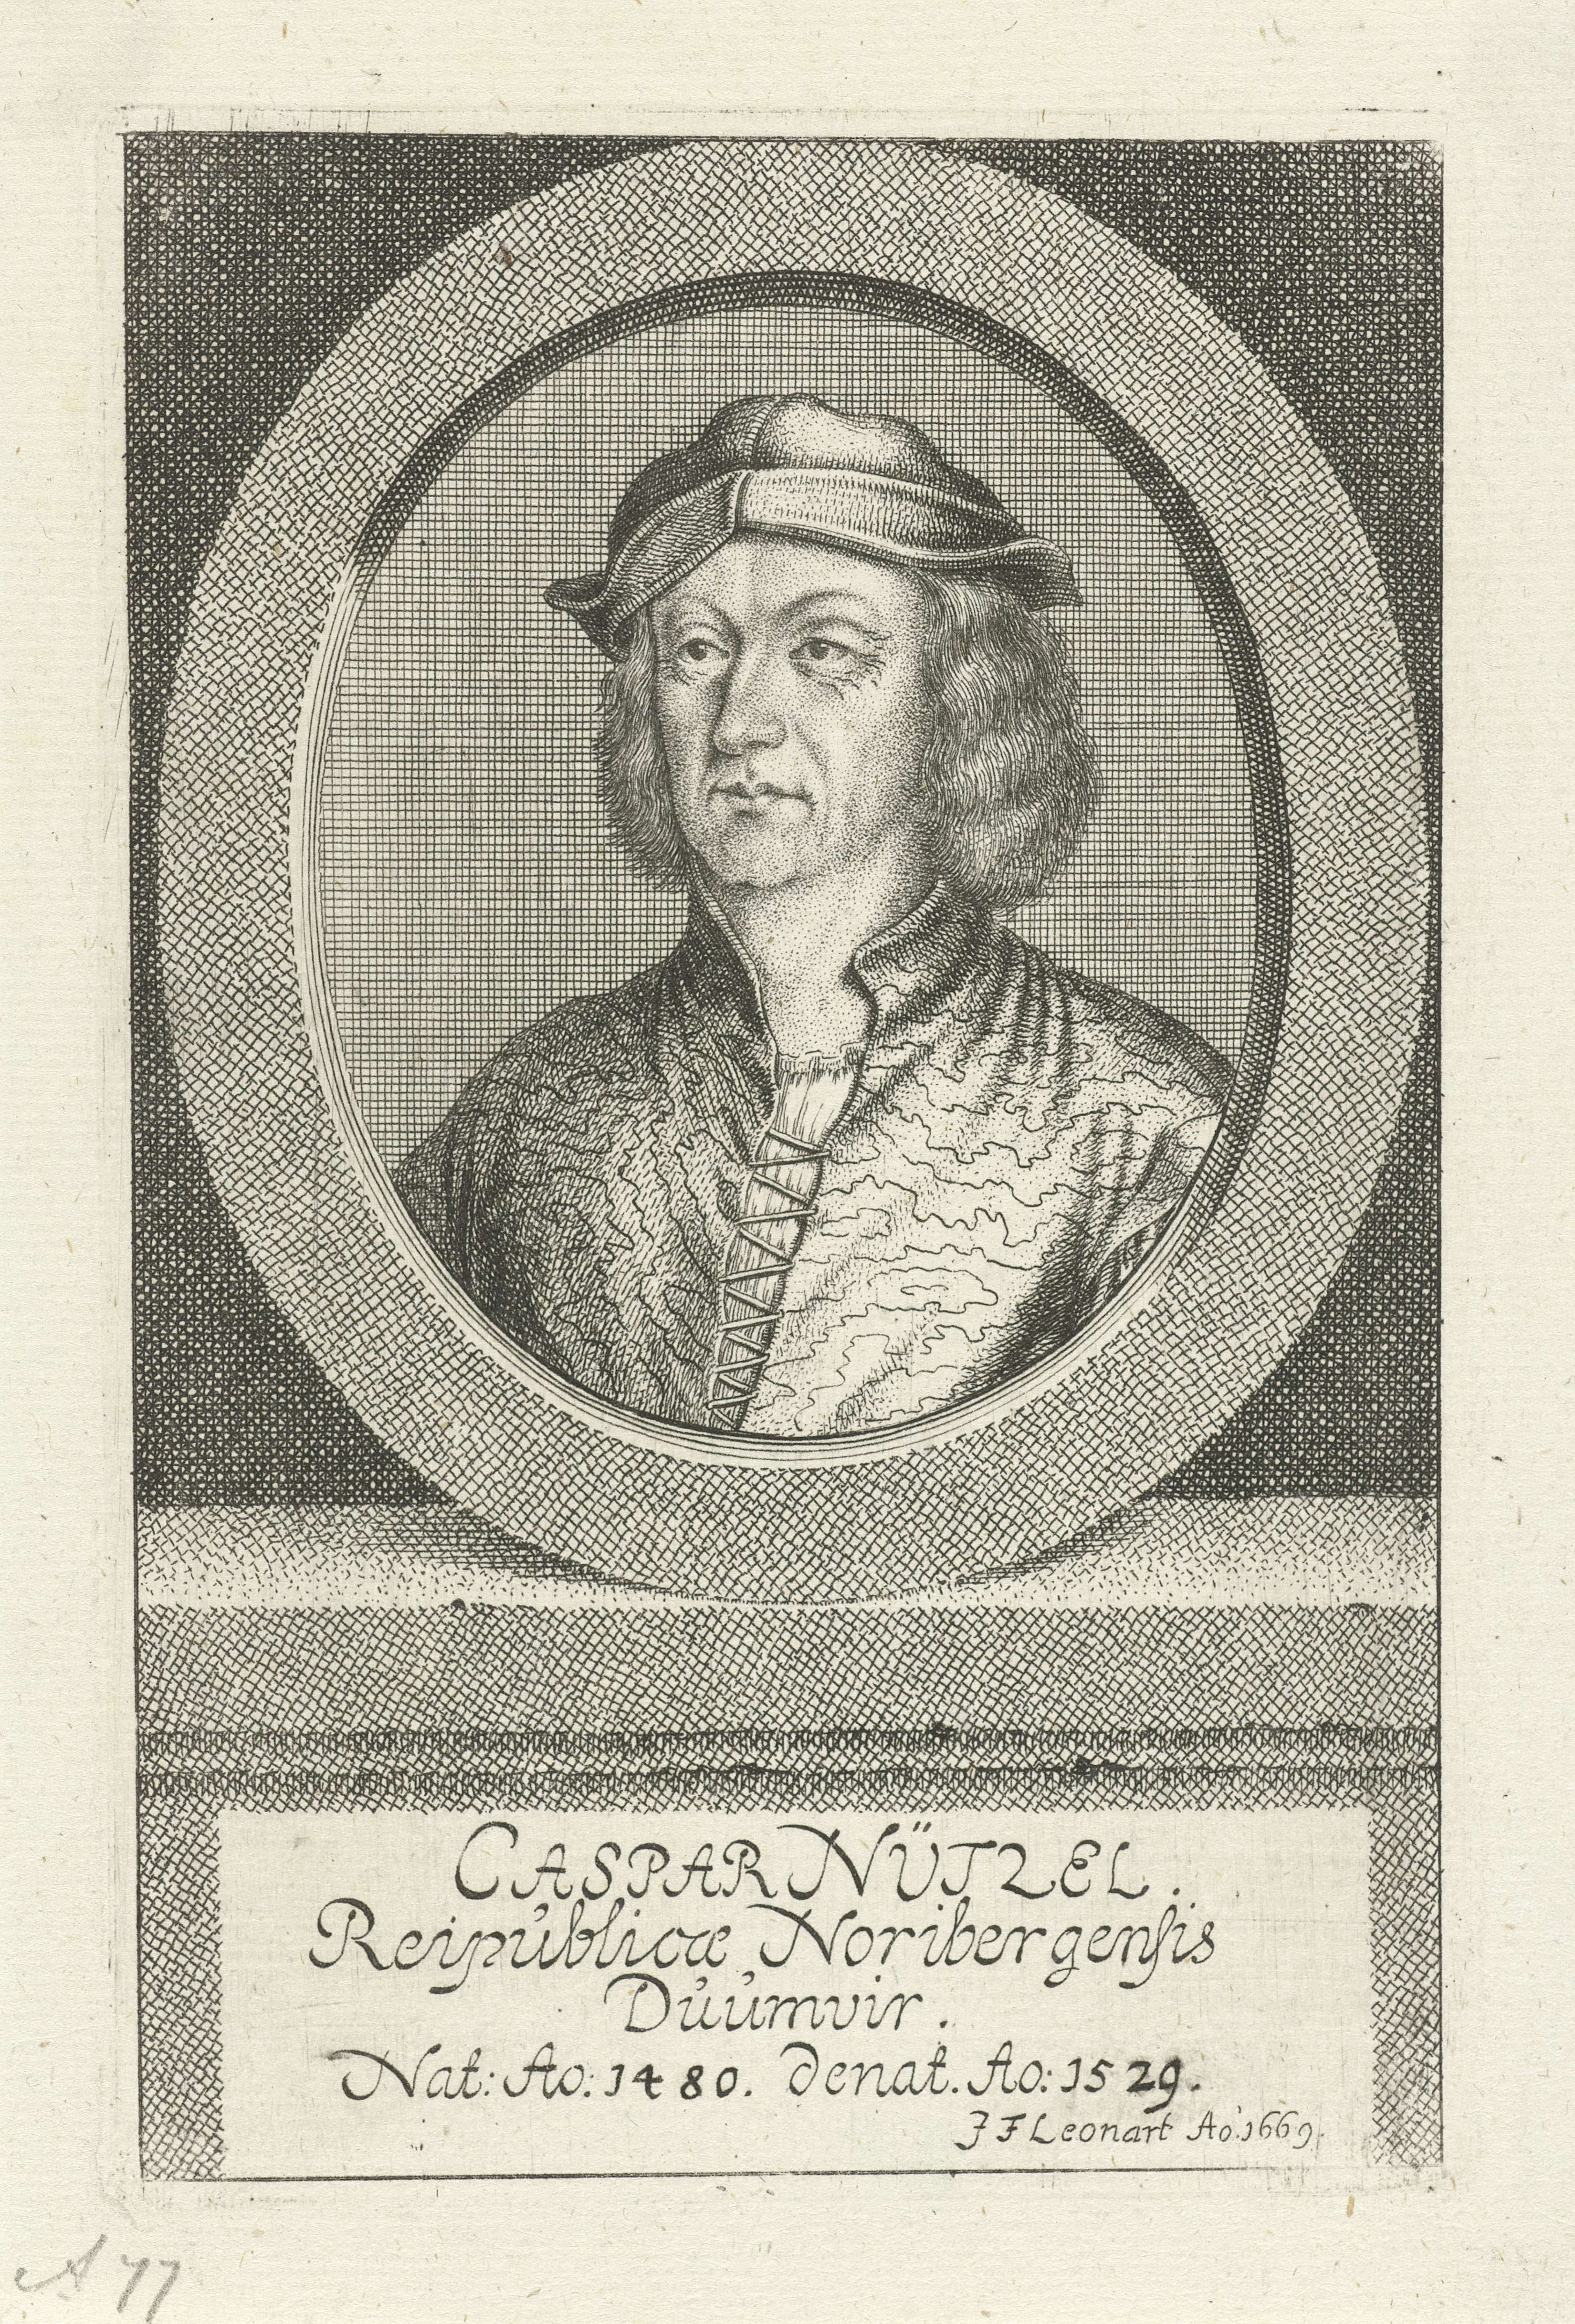 Johann Friedrich Leonard | Portret van Caspar Nützel, Johann Friedrich Leonard, 1669 | Portret van Caspar Nützel, magistraat te Neurenberg.